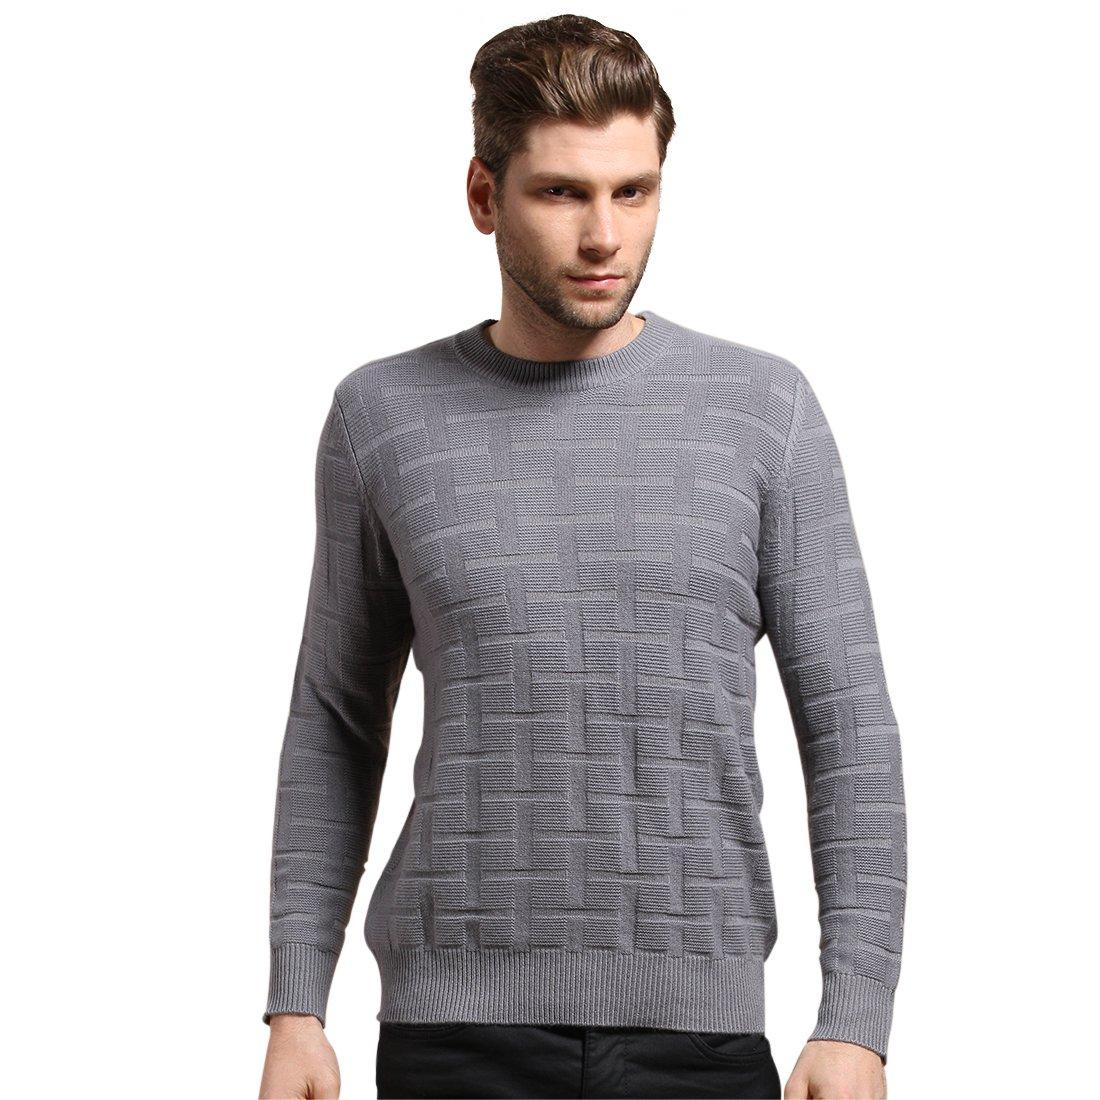 SpringAir Men's 100% Cashmere Sweater Square Long Sleeve Crewneck Pullover